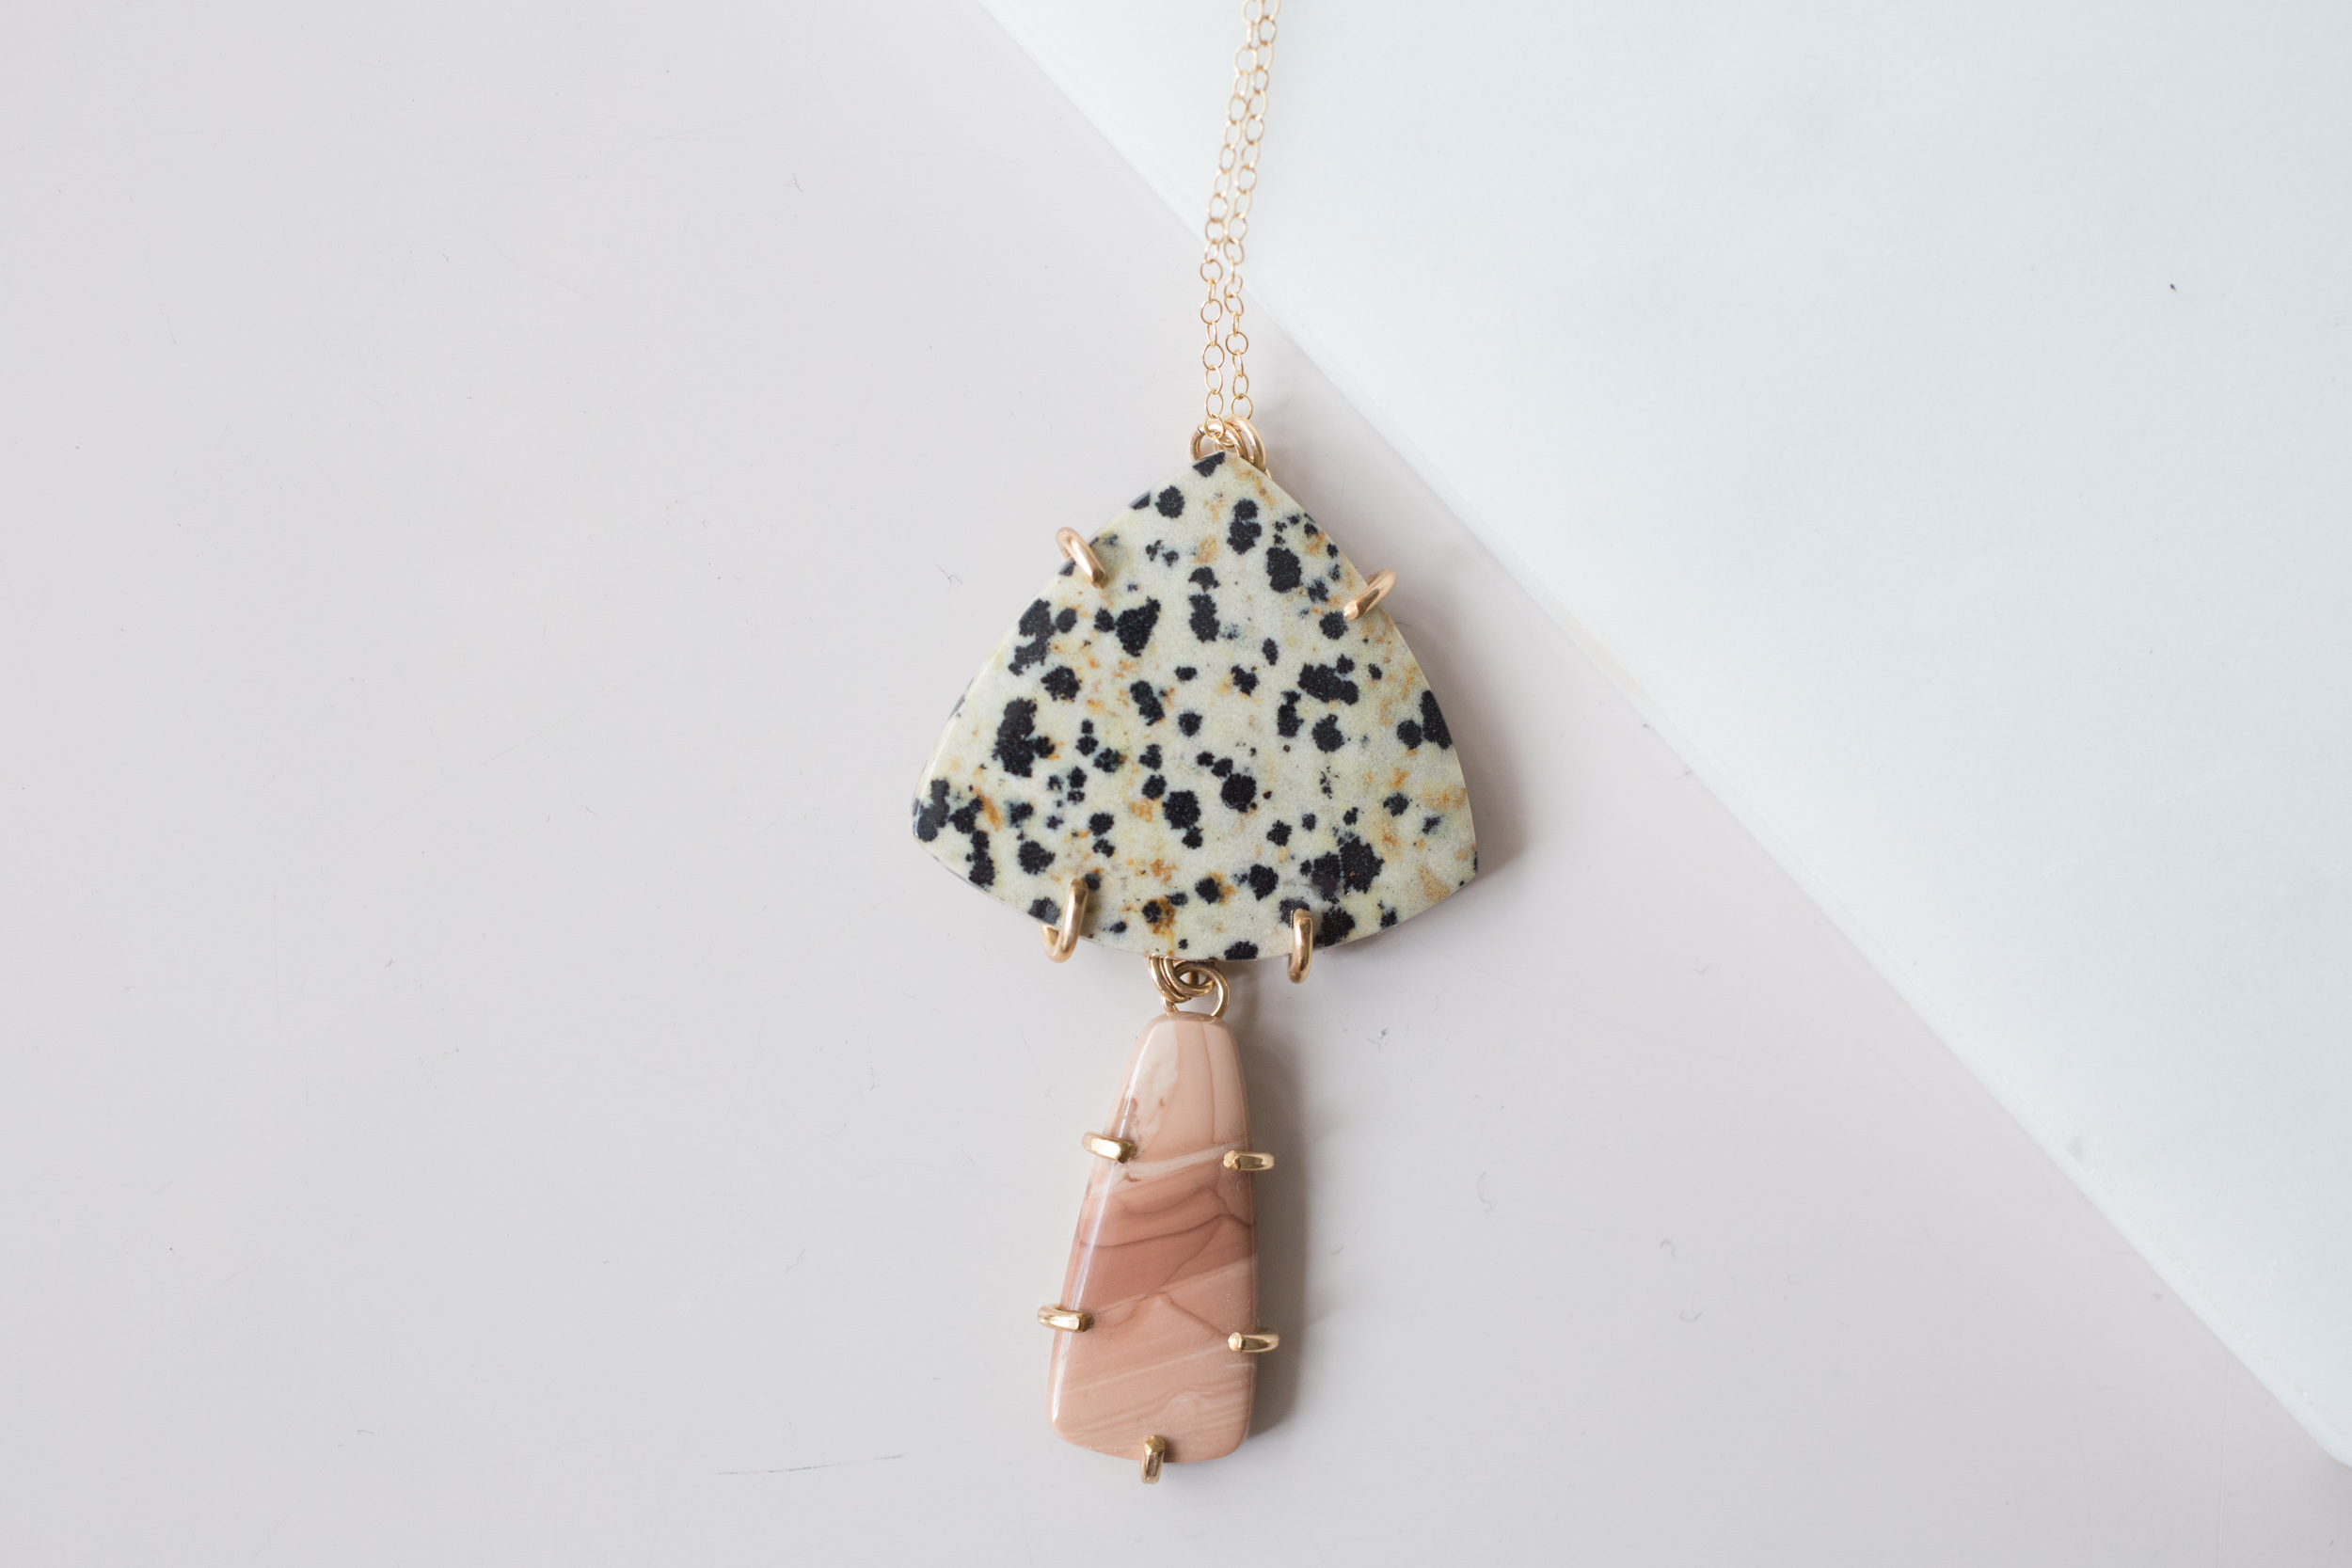 Jaguars on Dalmatian Jasper Necklace Sets